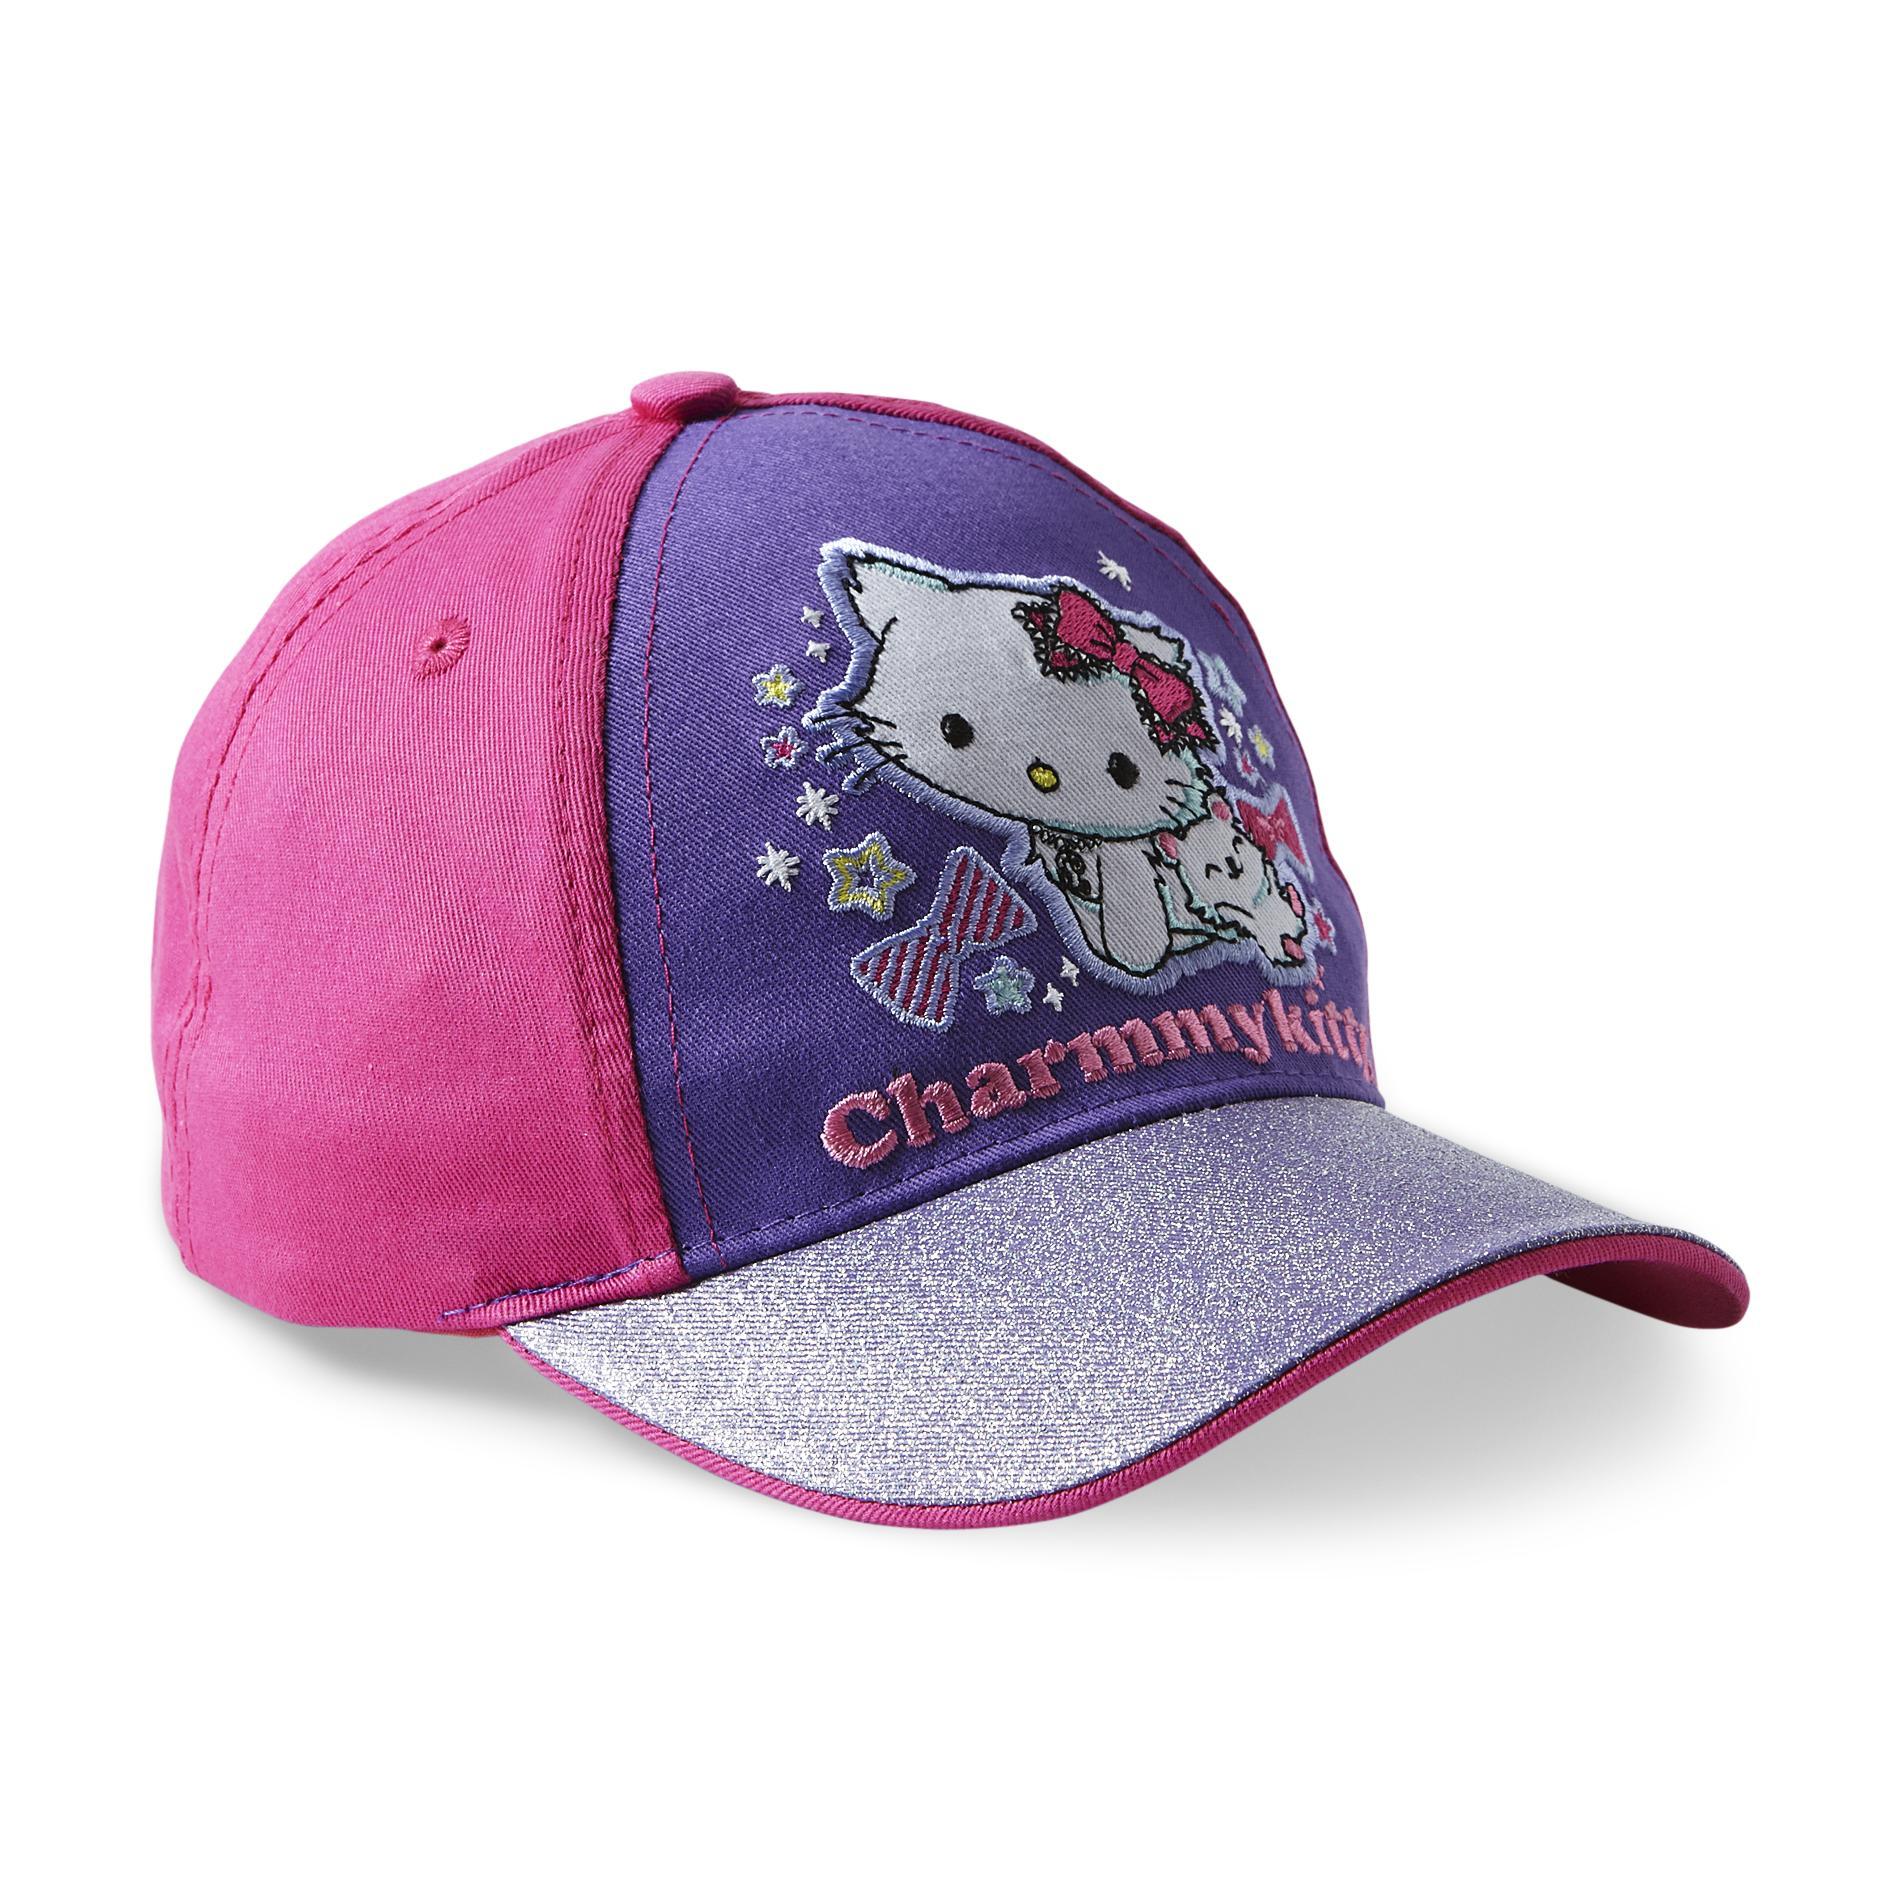 Sanrio Charmmykitty Girl's Baseball Hat